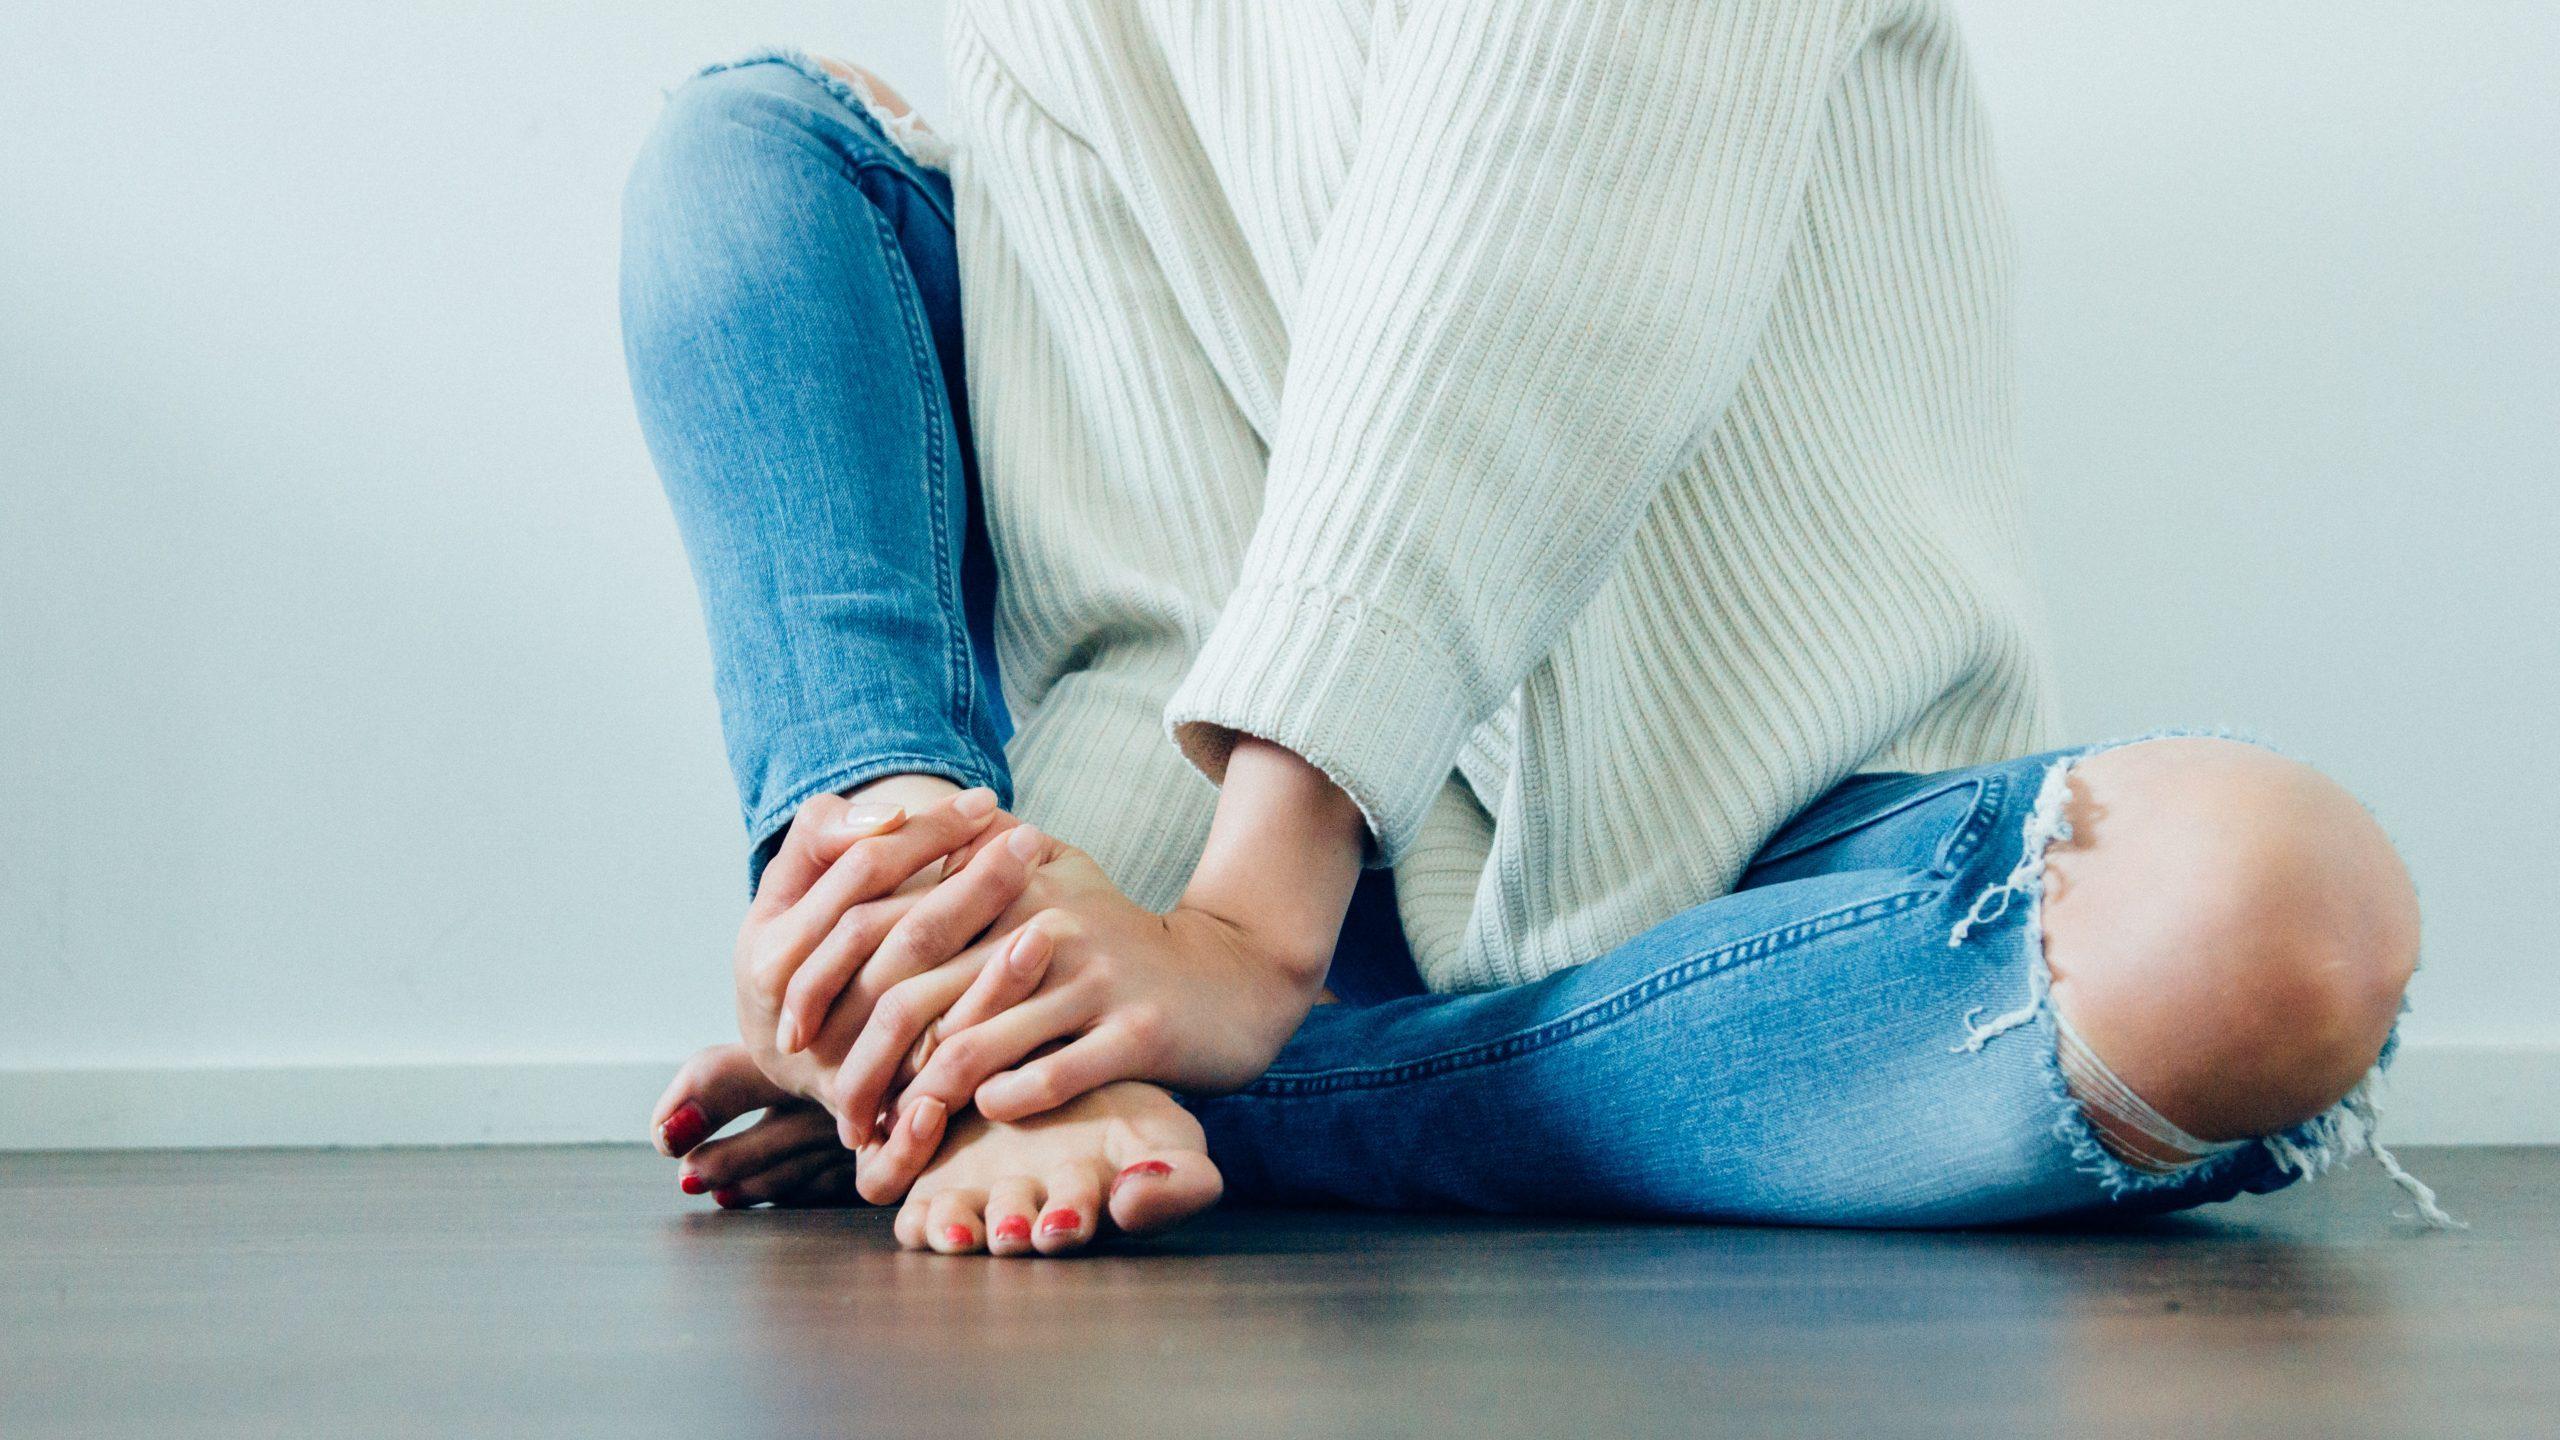 menstruationsschmerzen lindern